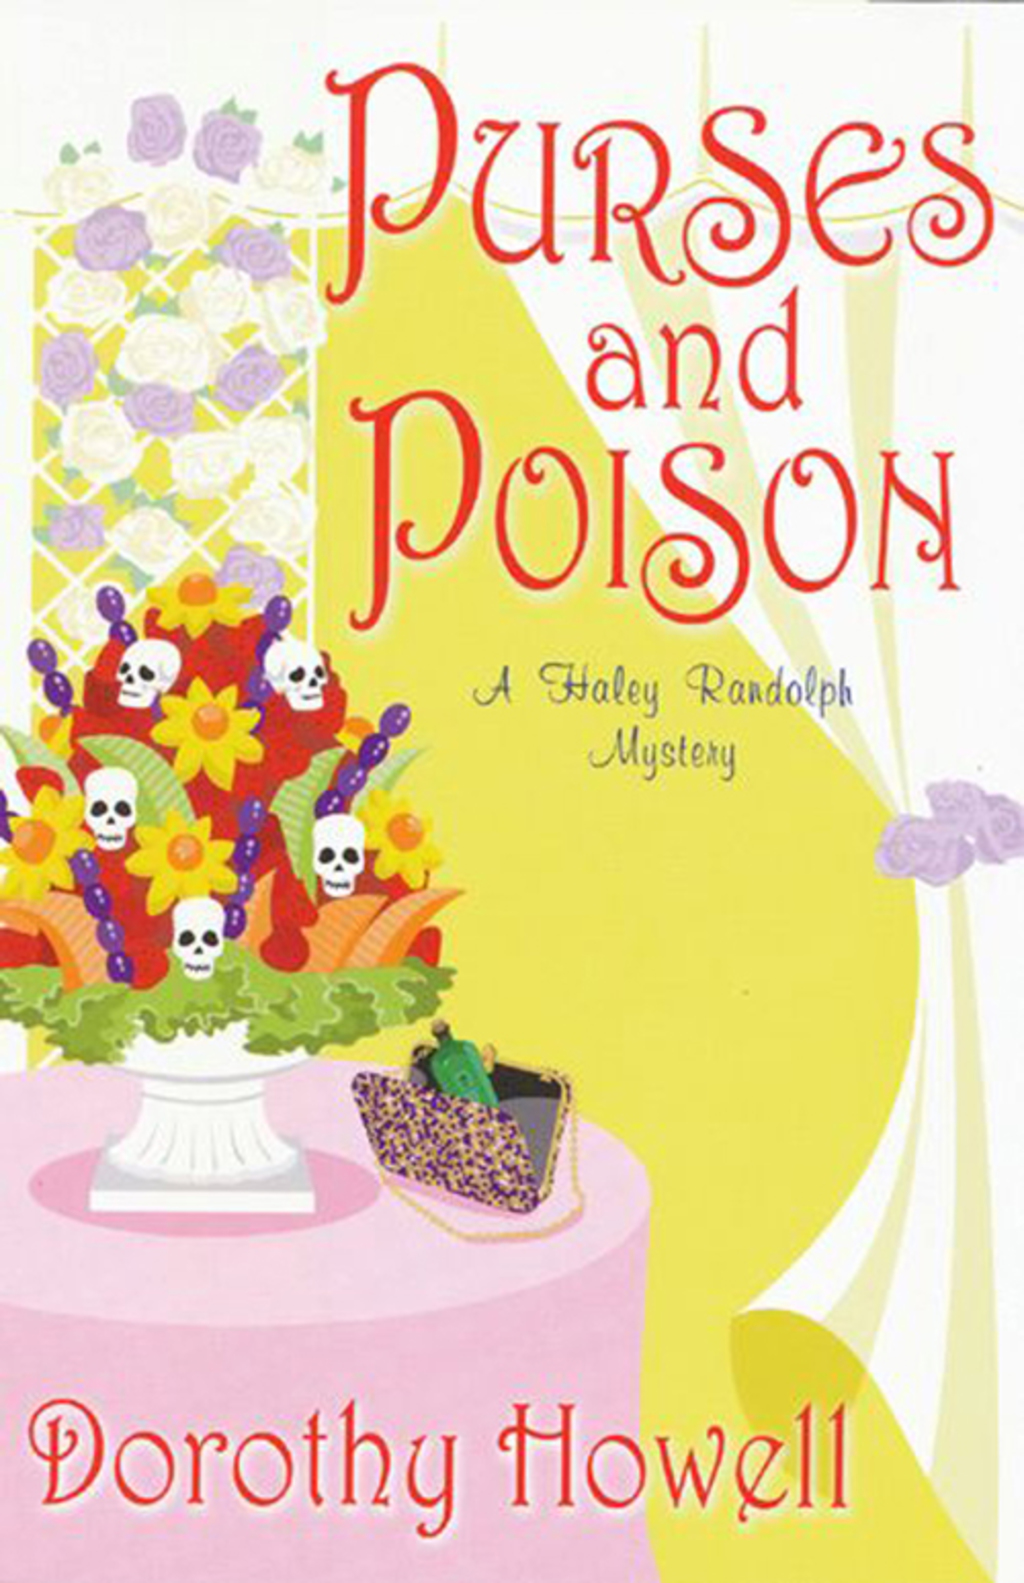 Purses and Poison (eBook) (9780758260369) photo